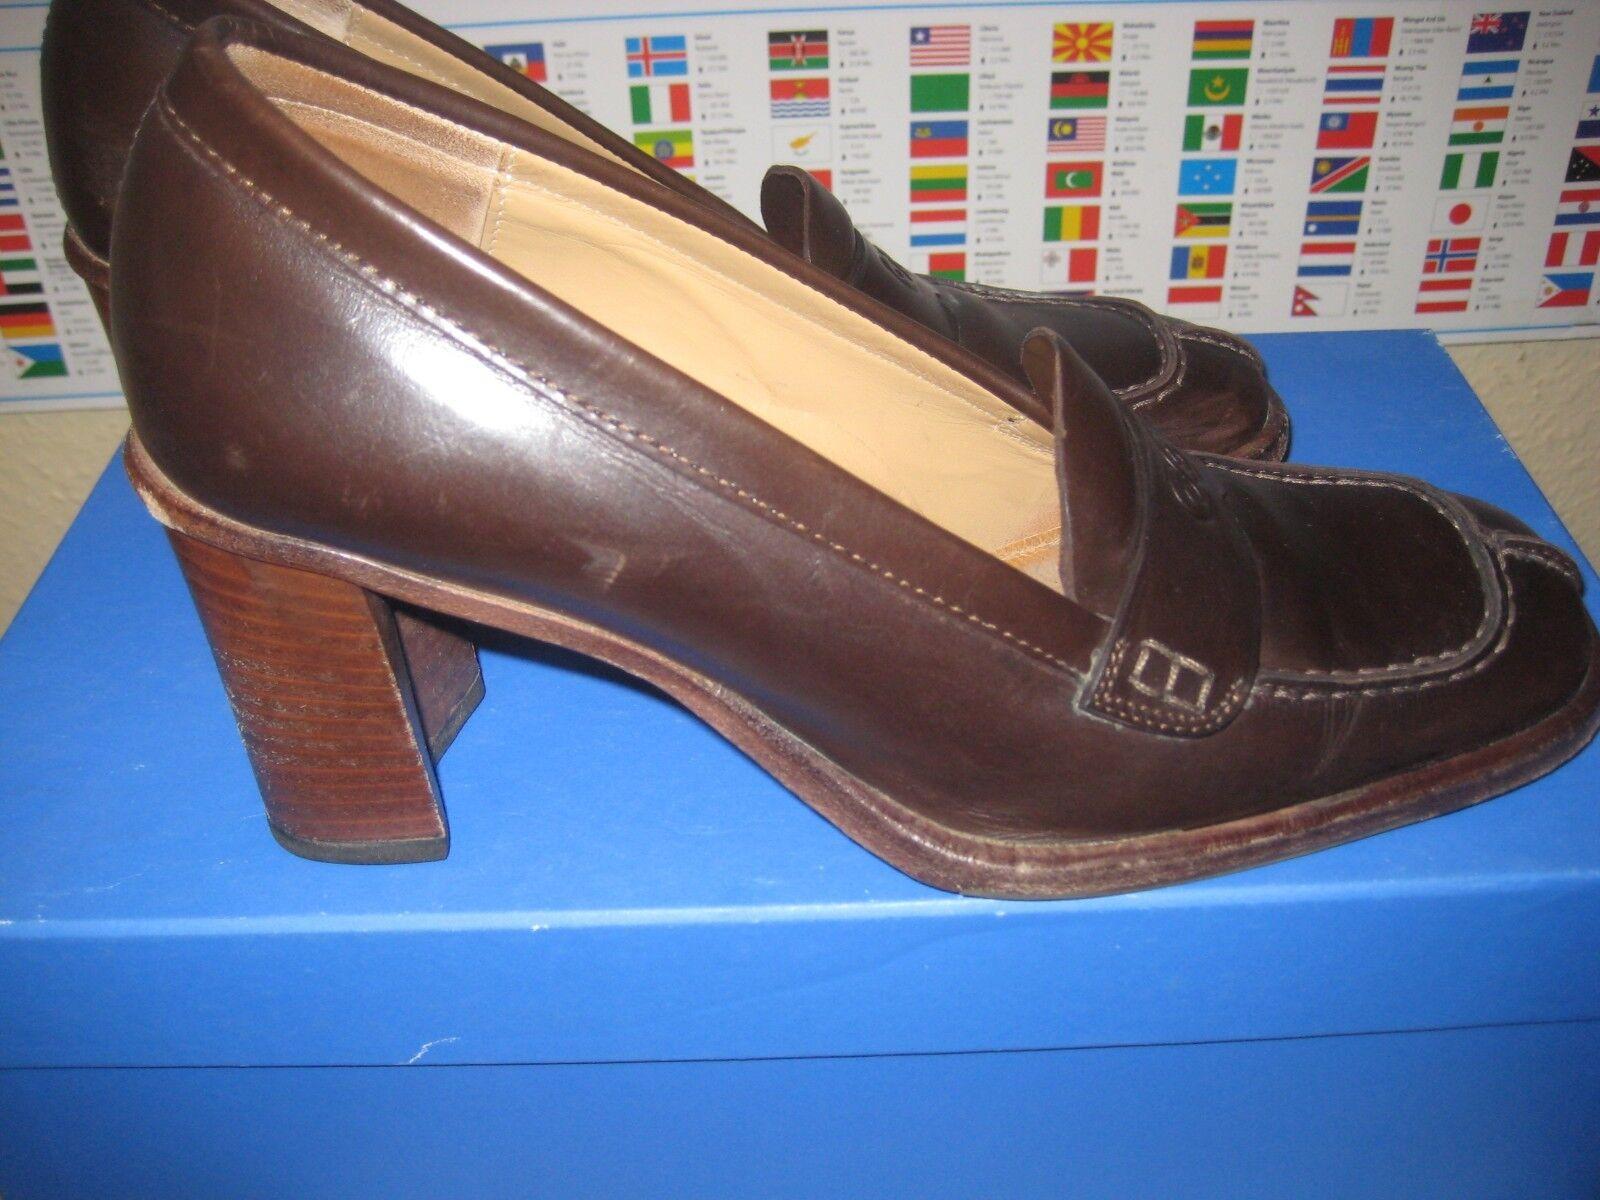 ESCADA Damen Leder, Schuhe, Leder, Damen schokobraun, Gr. 35 f98f77